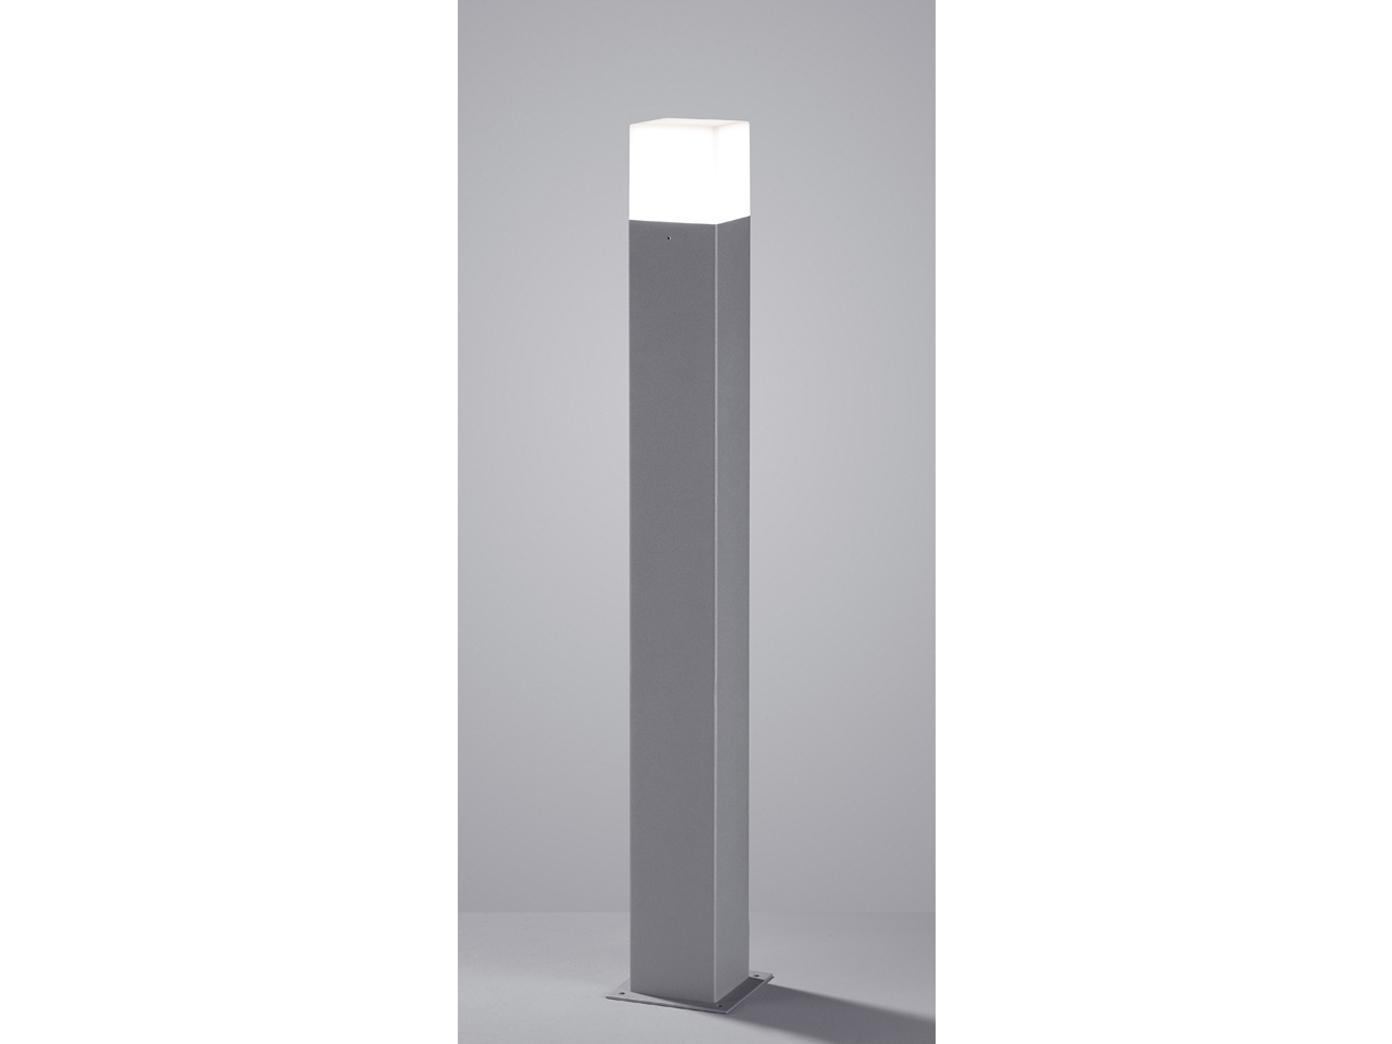 LED Außen-Standleuchte HUDSON, titan, inkl. 1 x E14, 4 W, H.: 80cm